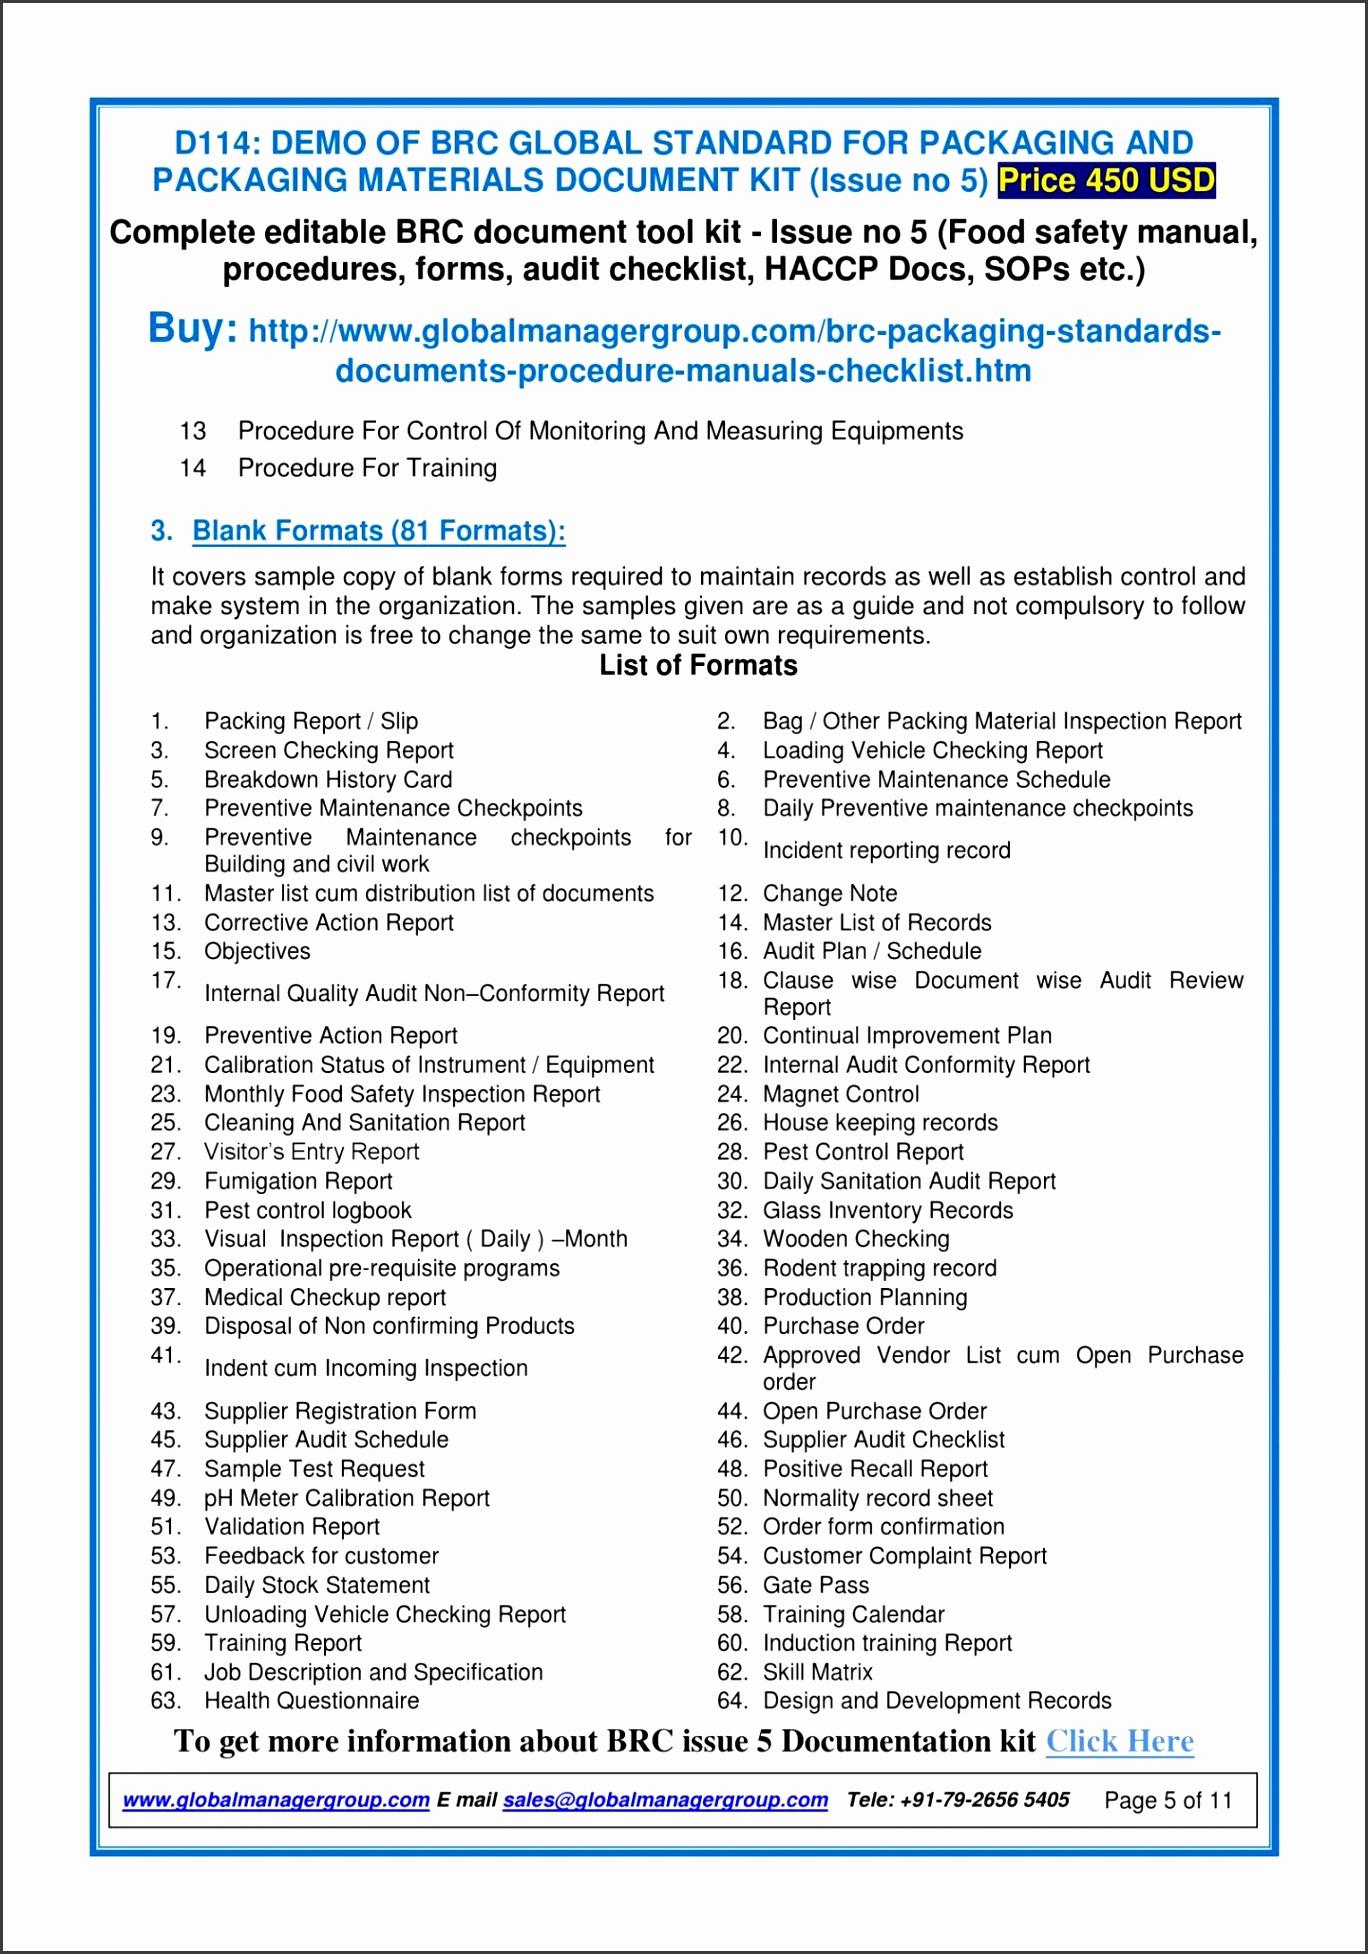 5 Professional Price List Template SampleTemplatess SampleTemplatess